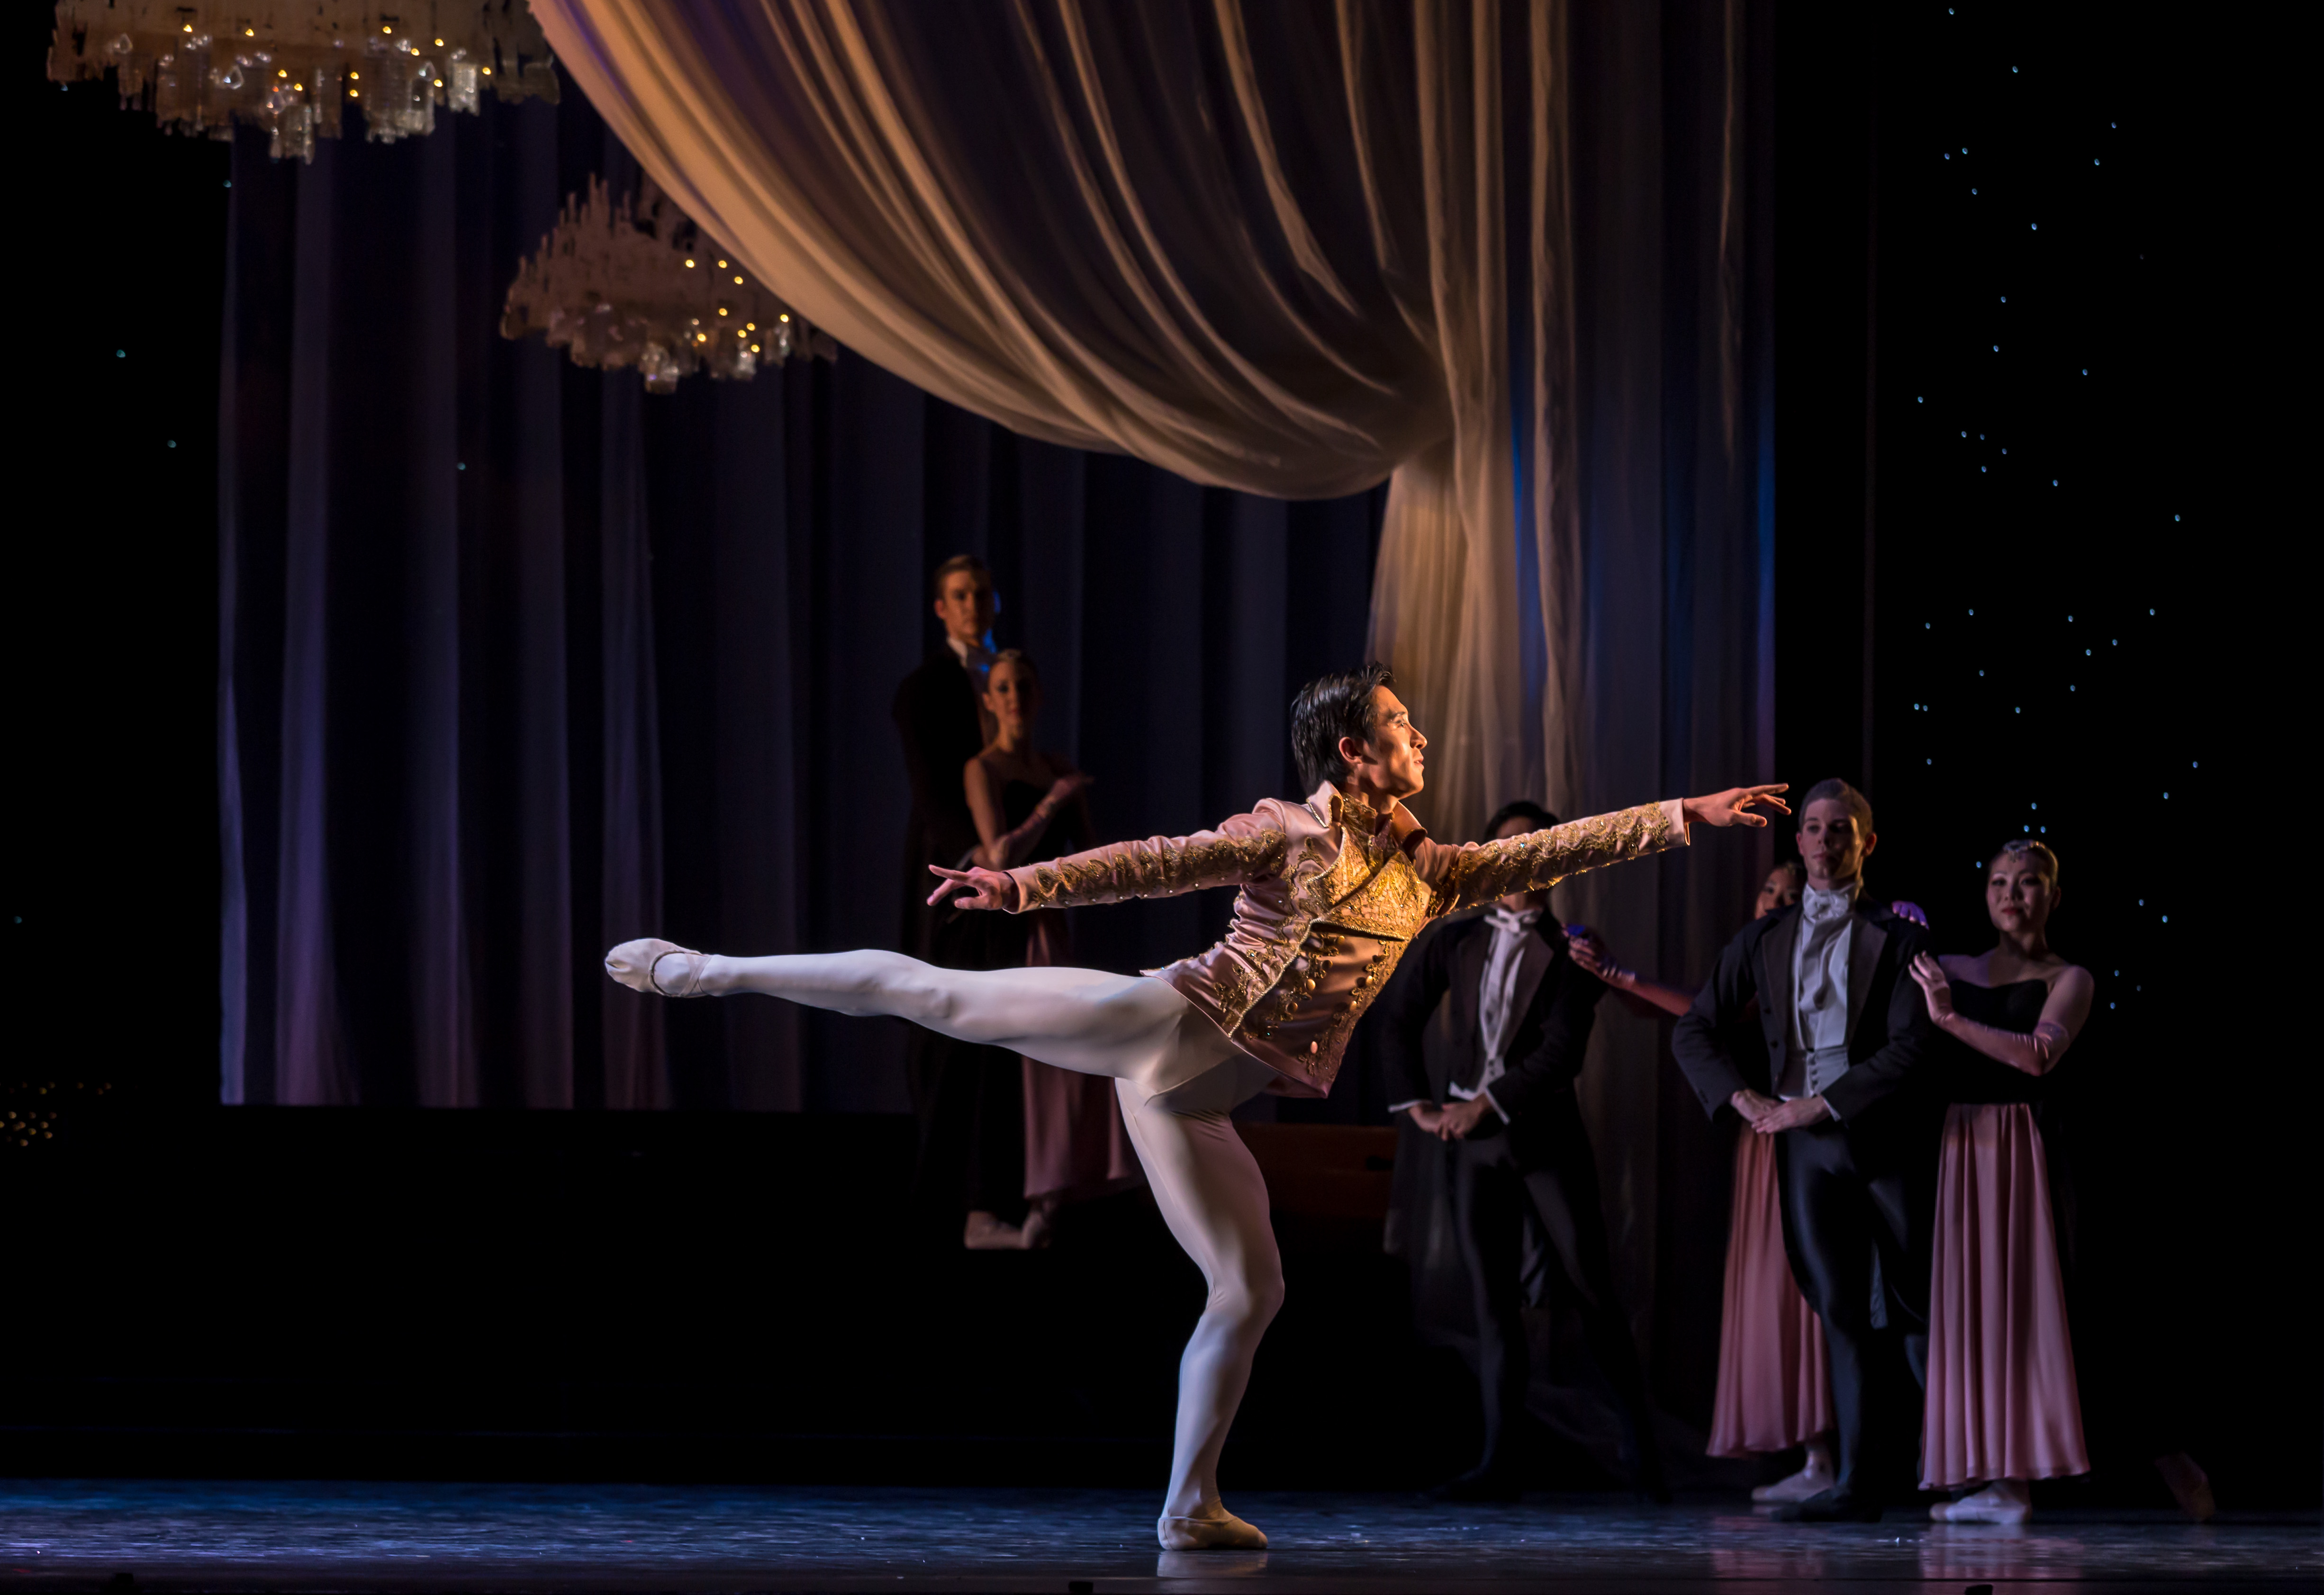 RNZB Cinderella - Qi Huan as the Prince PHOTO Evan Li